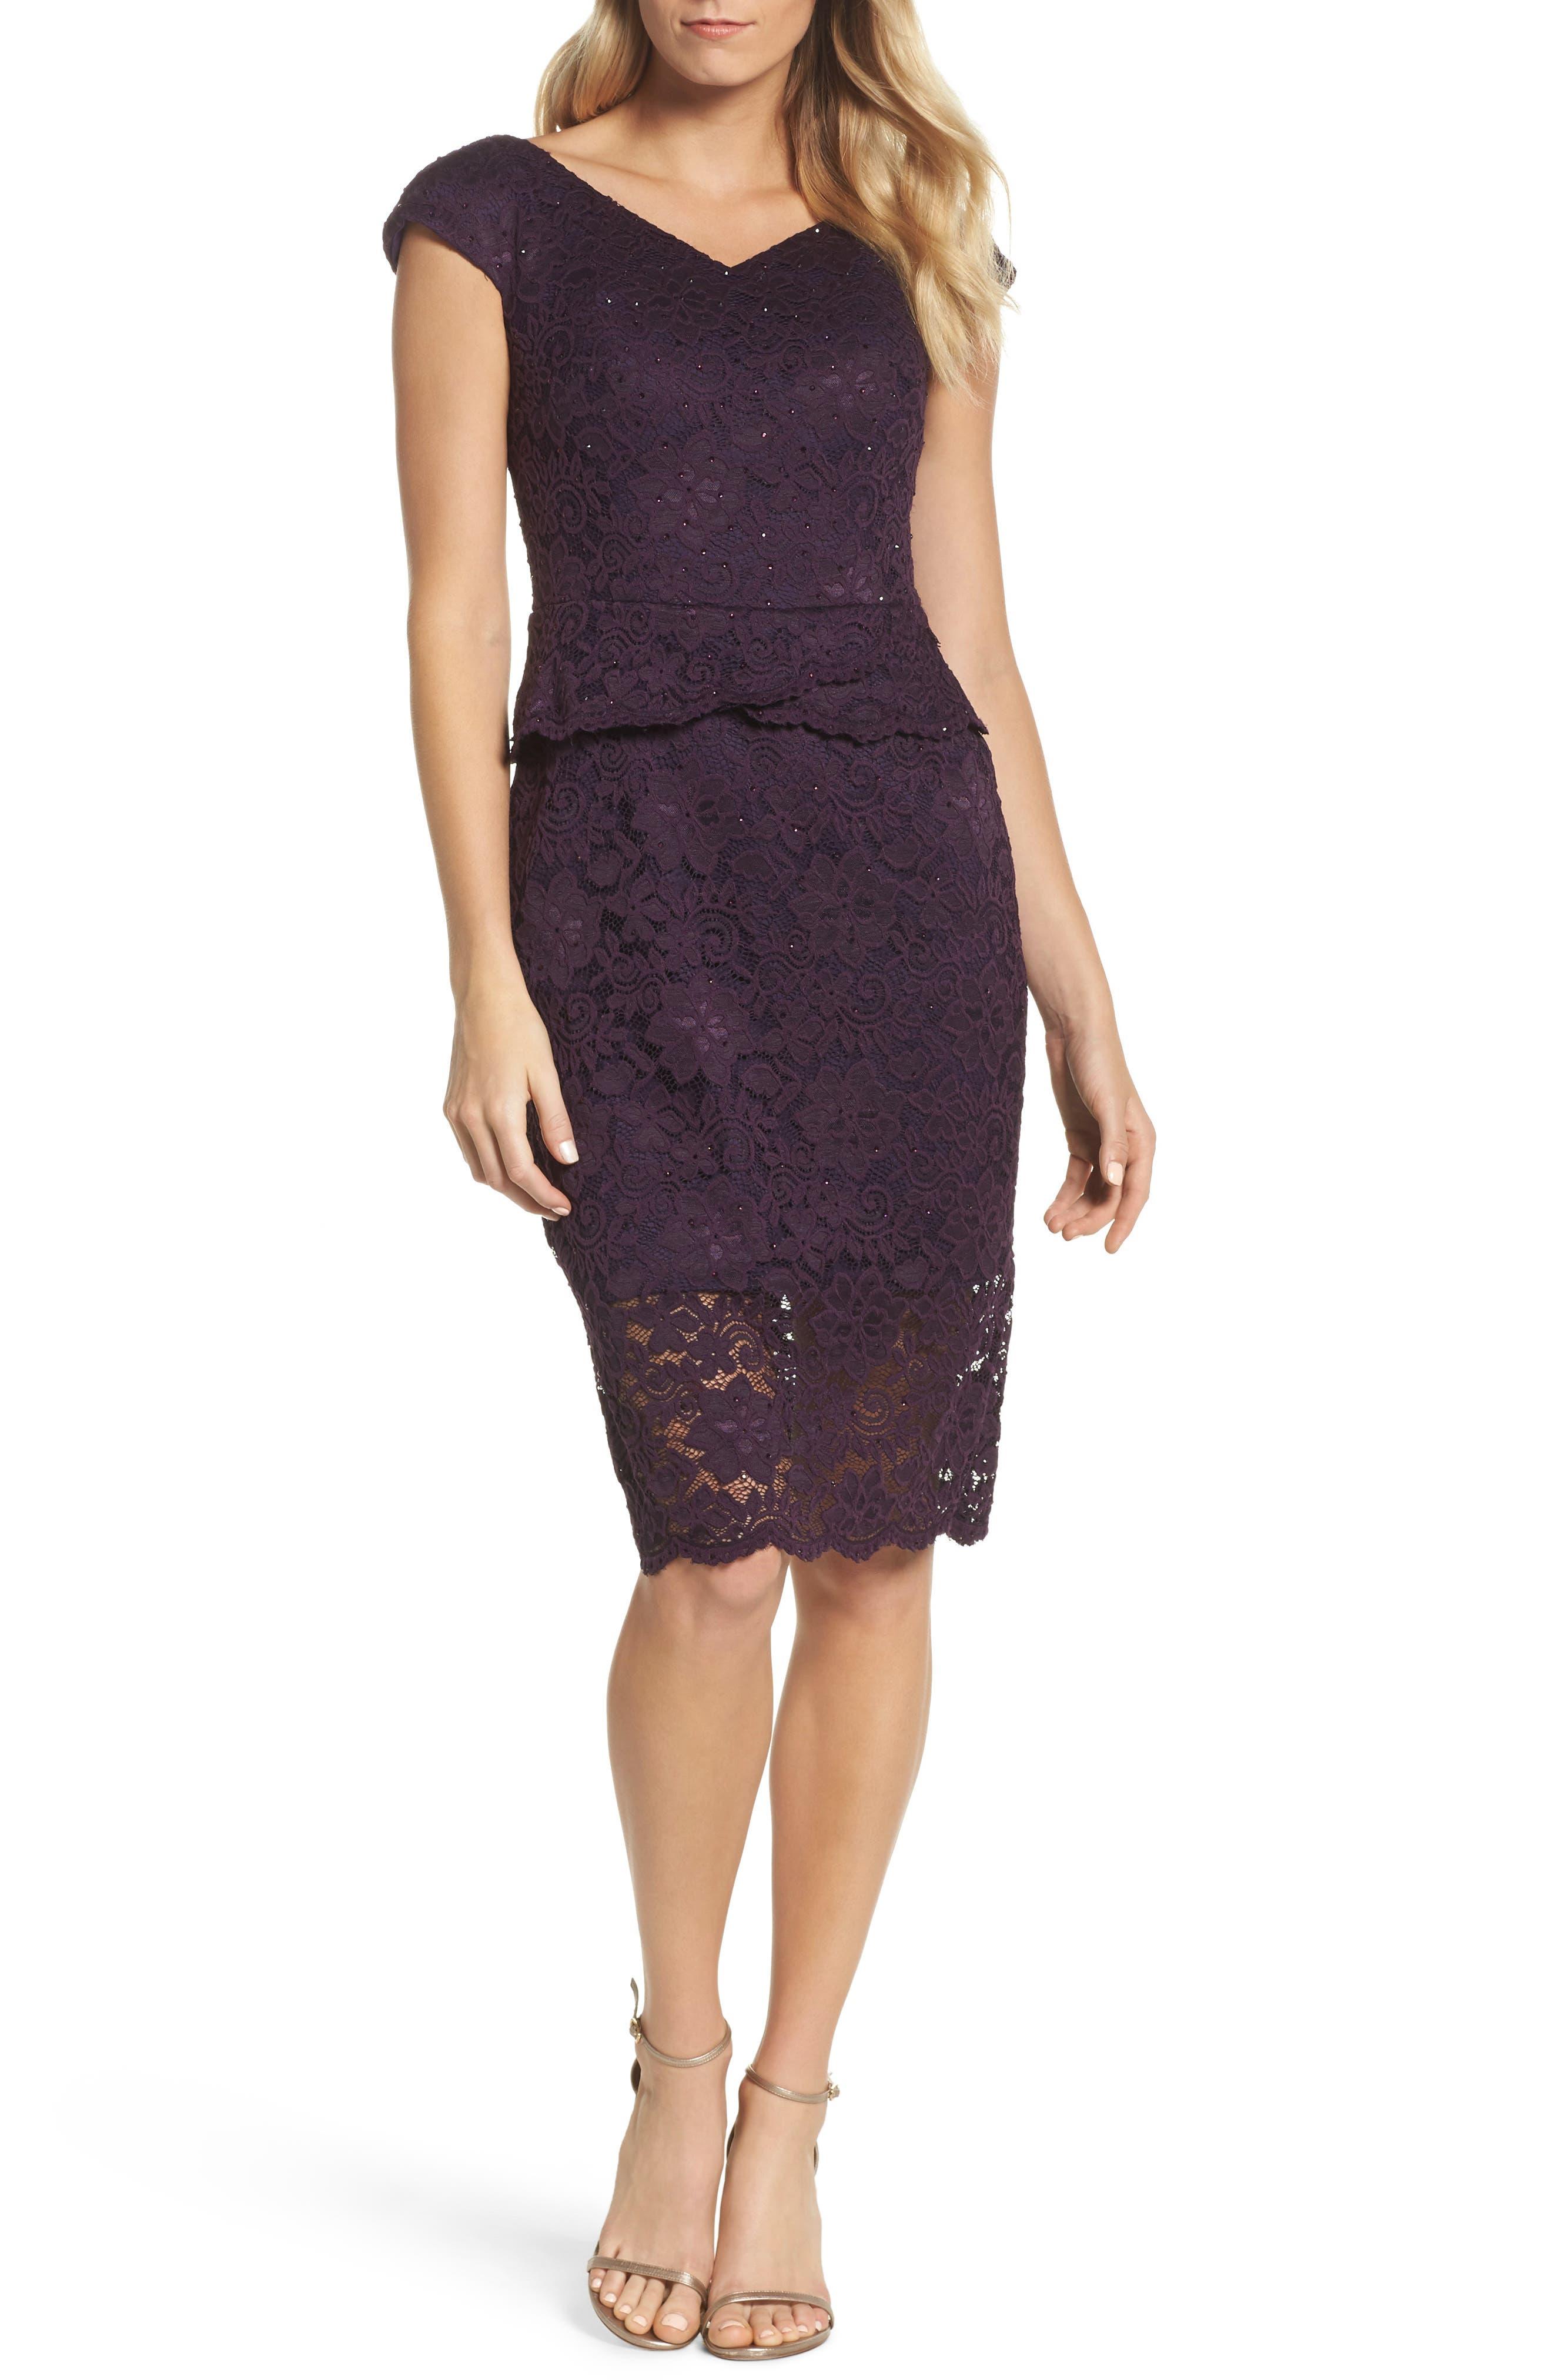 LA FEMME Embellished Lace Sheath Dress, Main, color, 501